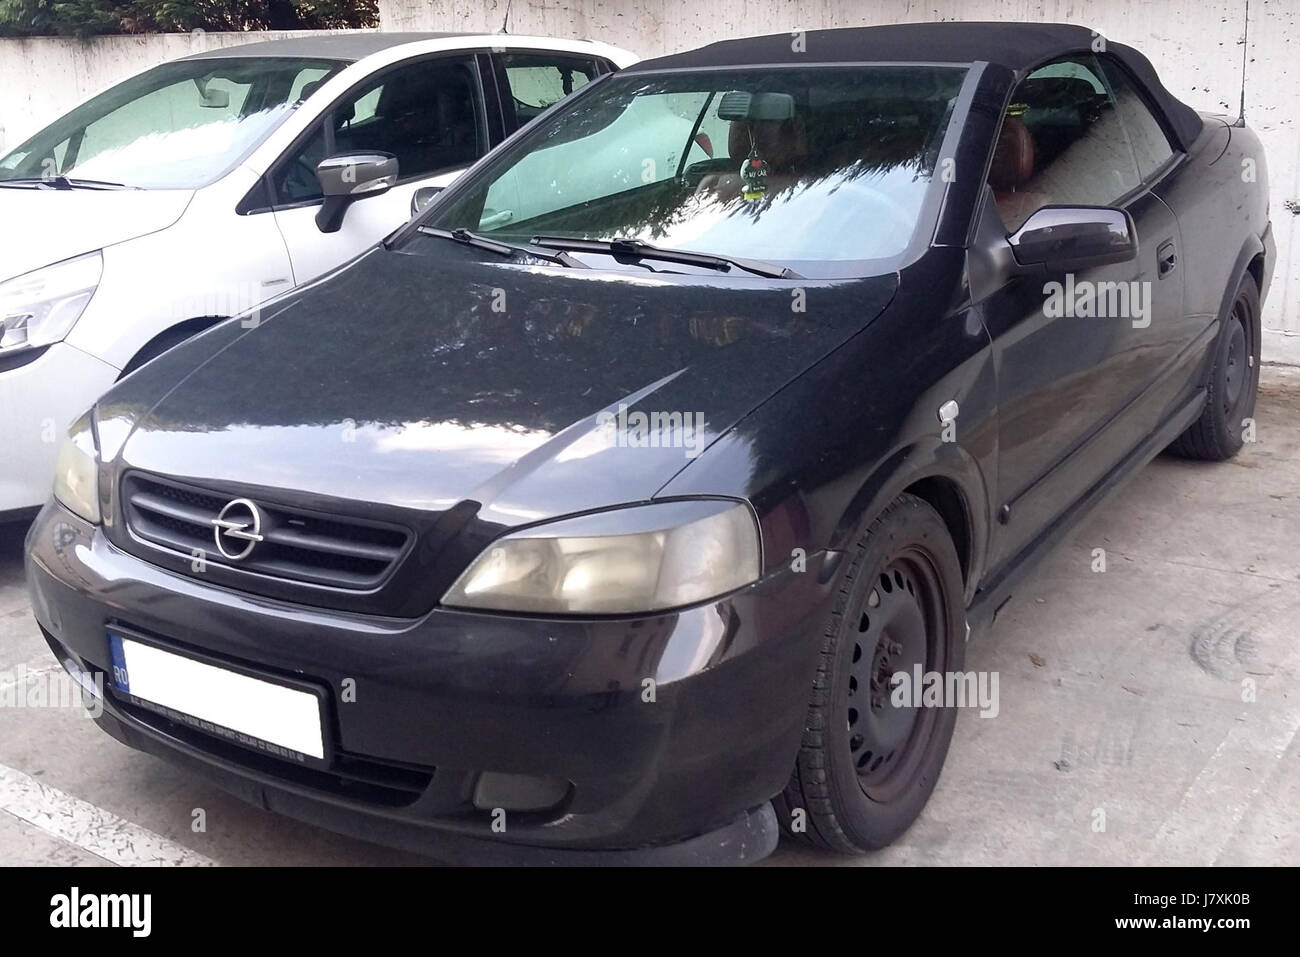 1998 2009 Opel Astra Cabrio - Stock Image